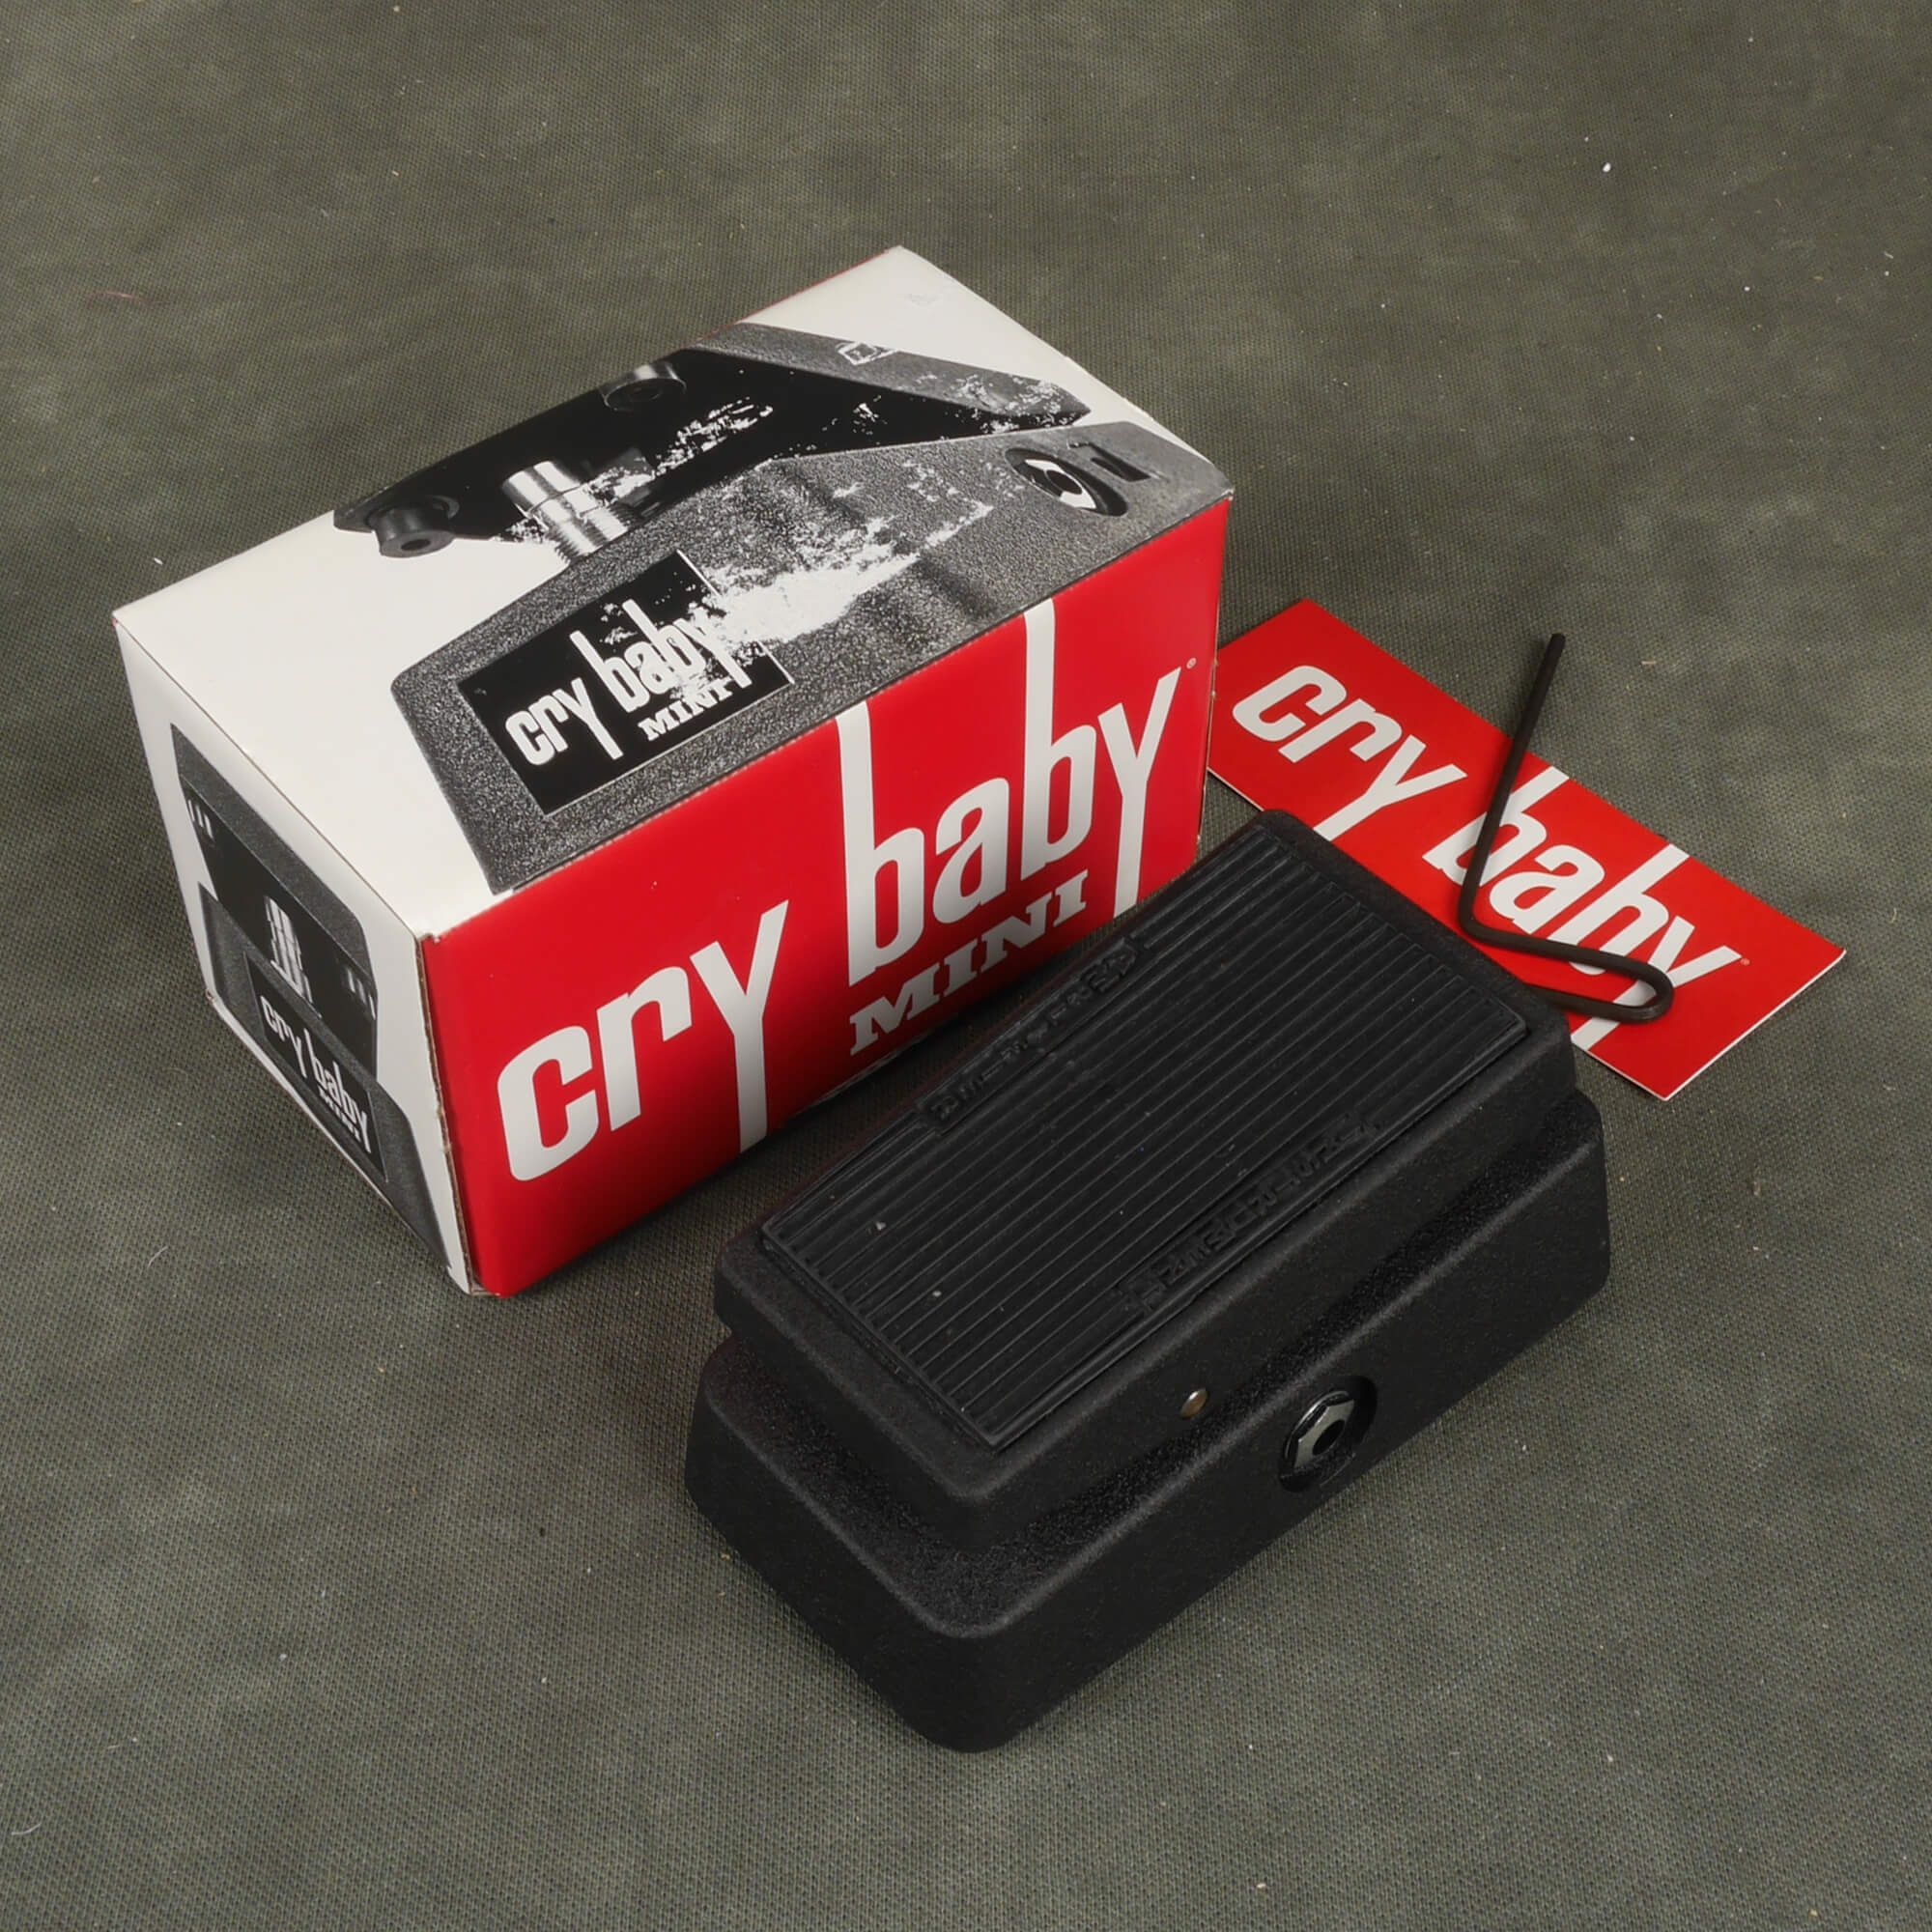 Jim Dunlop CBM95 Cry Baby Mini Wah Pedal w/Box - 2nd Hand